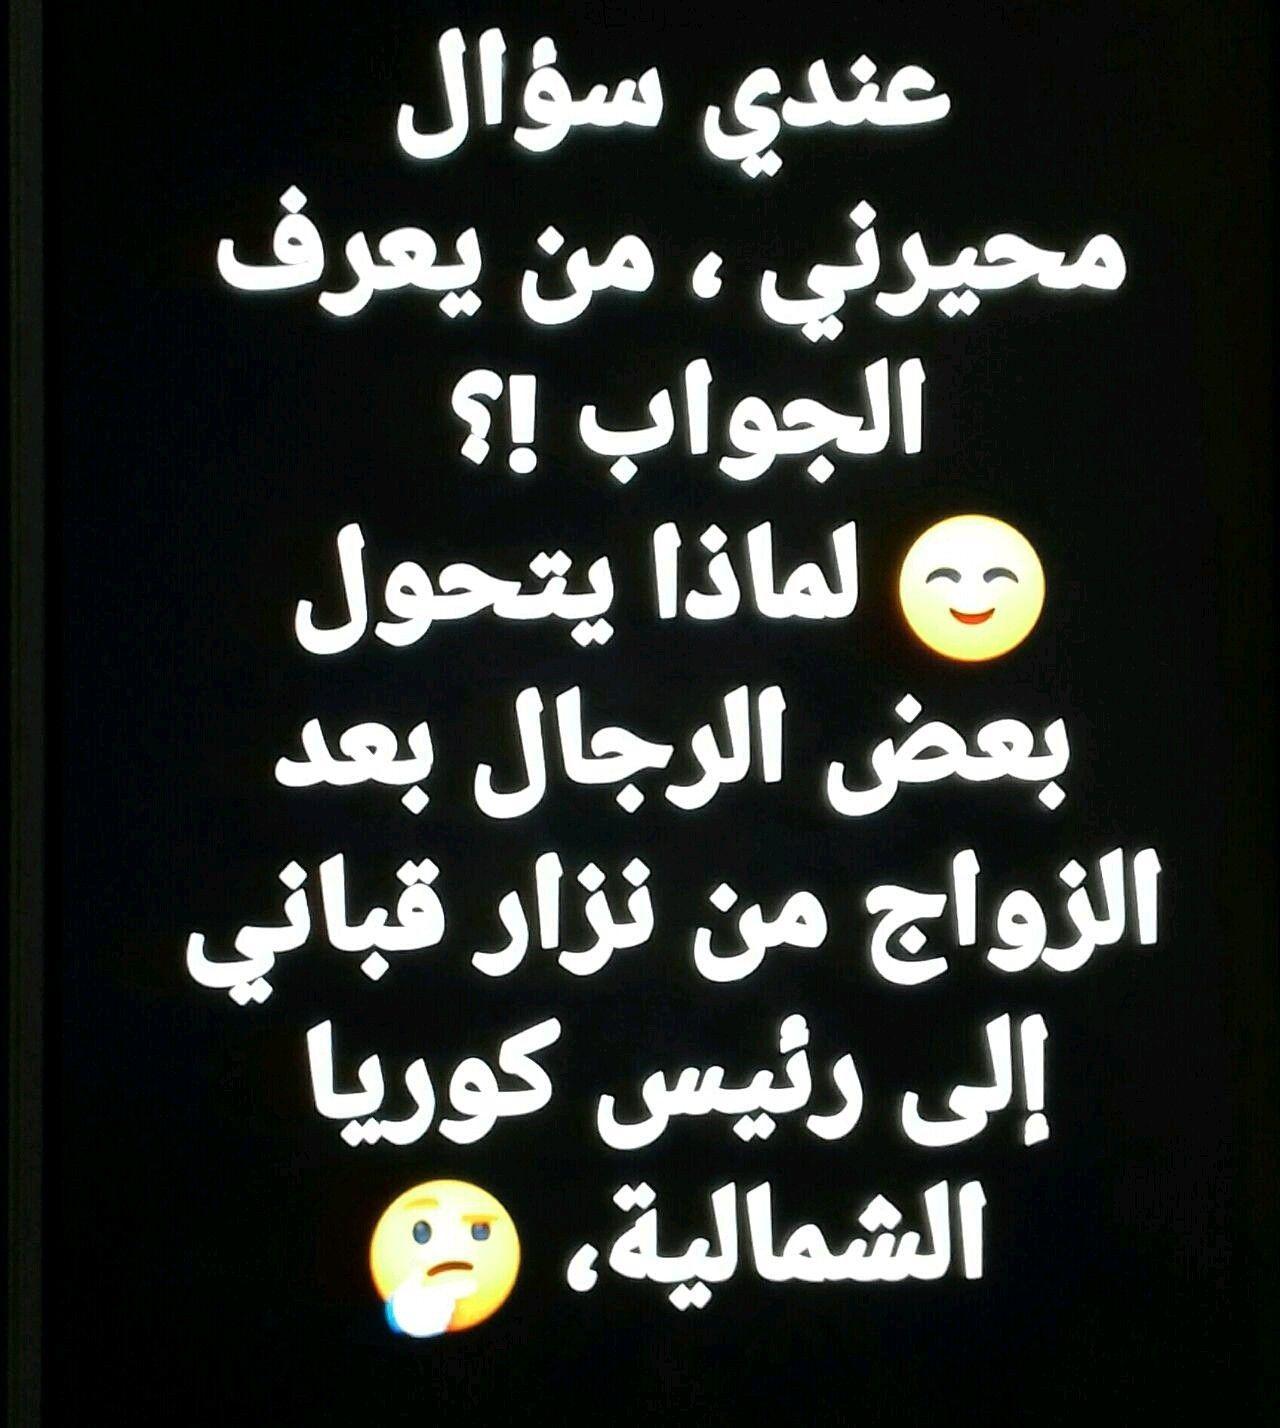 Pin By Hasan Zubi On كوميديا سوداء وألوان اخرى Arabic Funny Neon Art Art Wallpaper